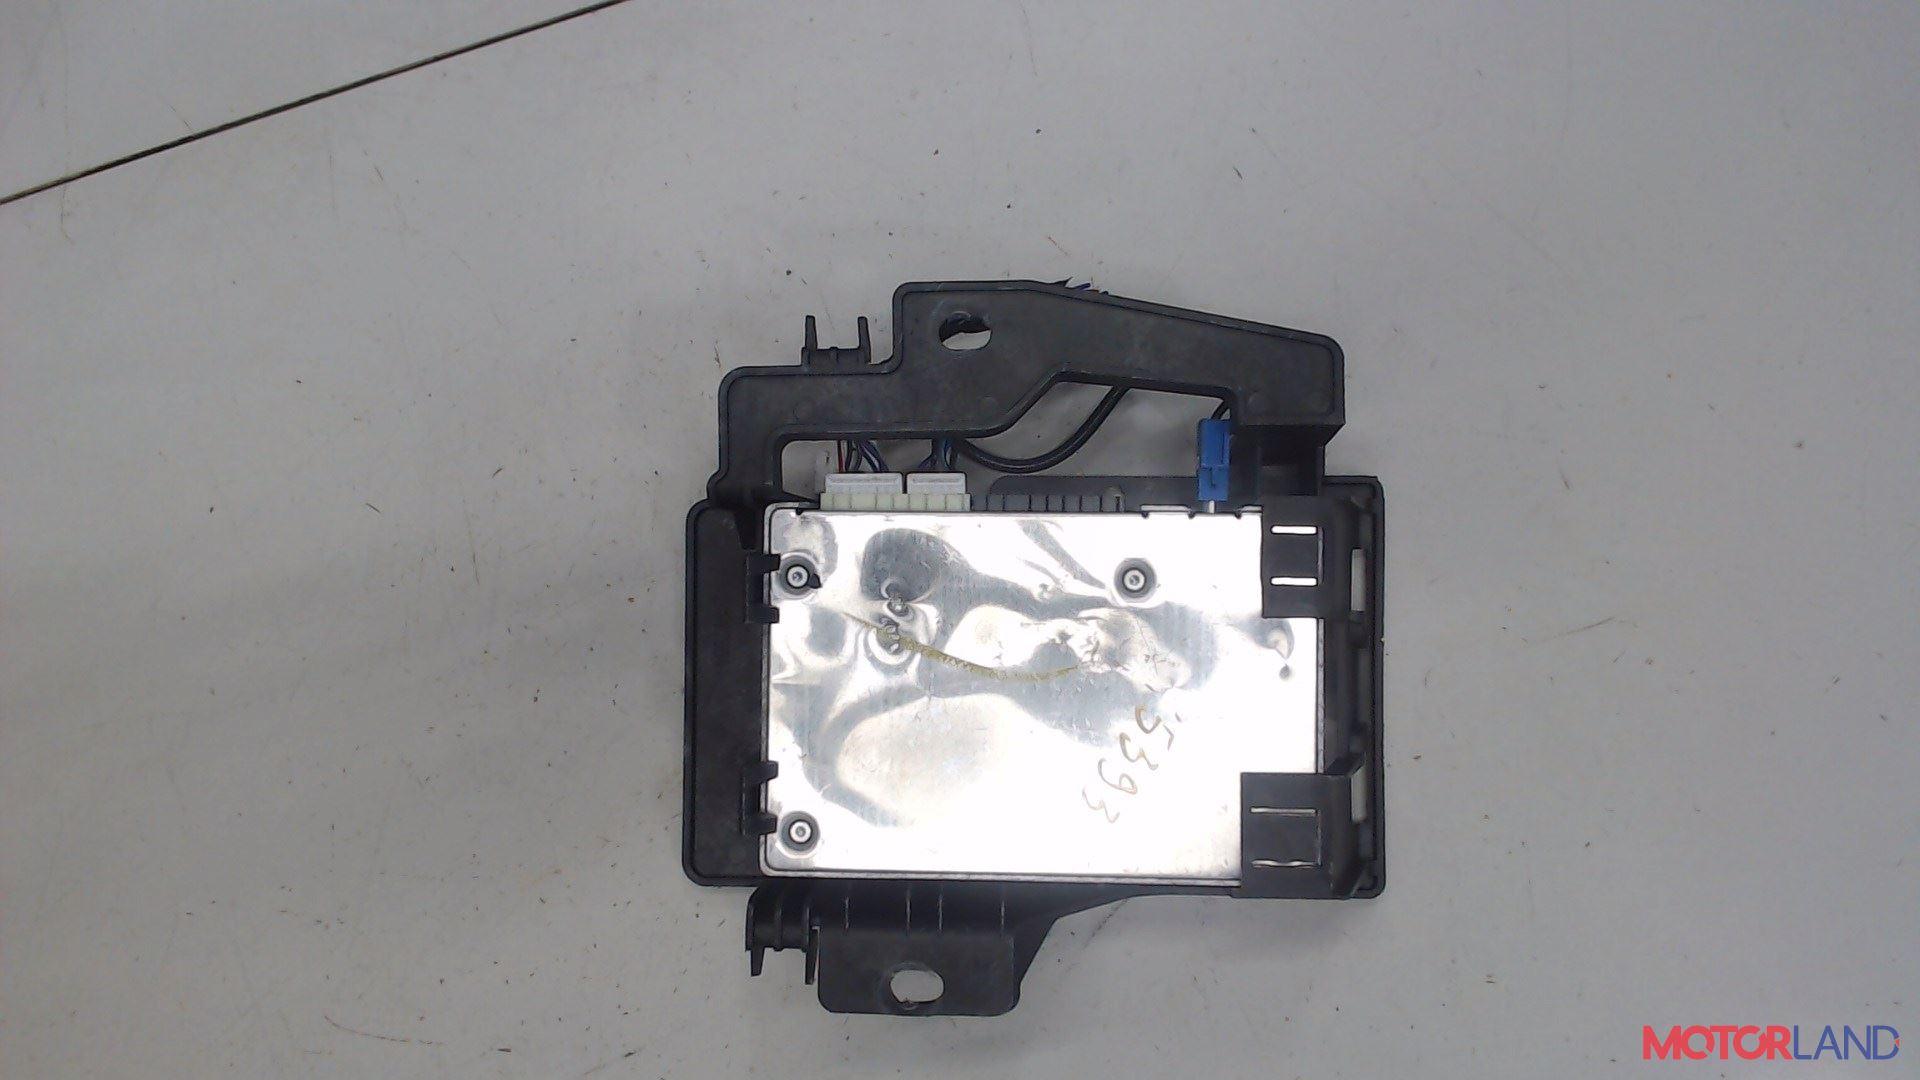 Блок управления (ЭБУ) Cadillac SRX 2004-2009, Артикул 5329508 #1